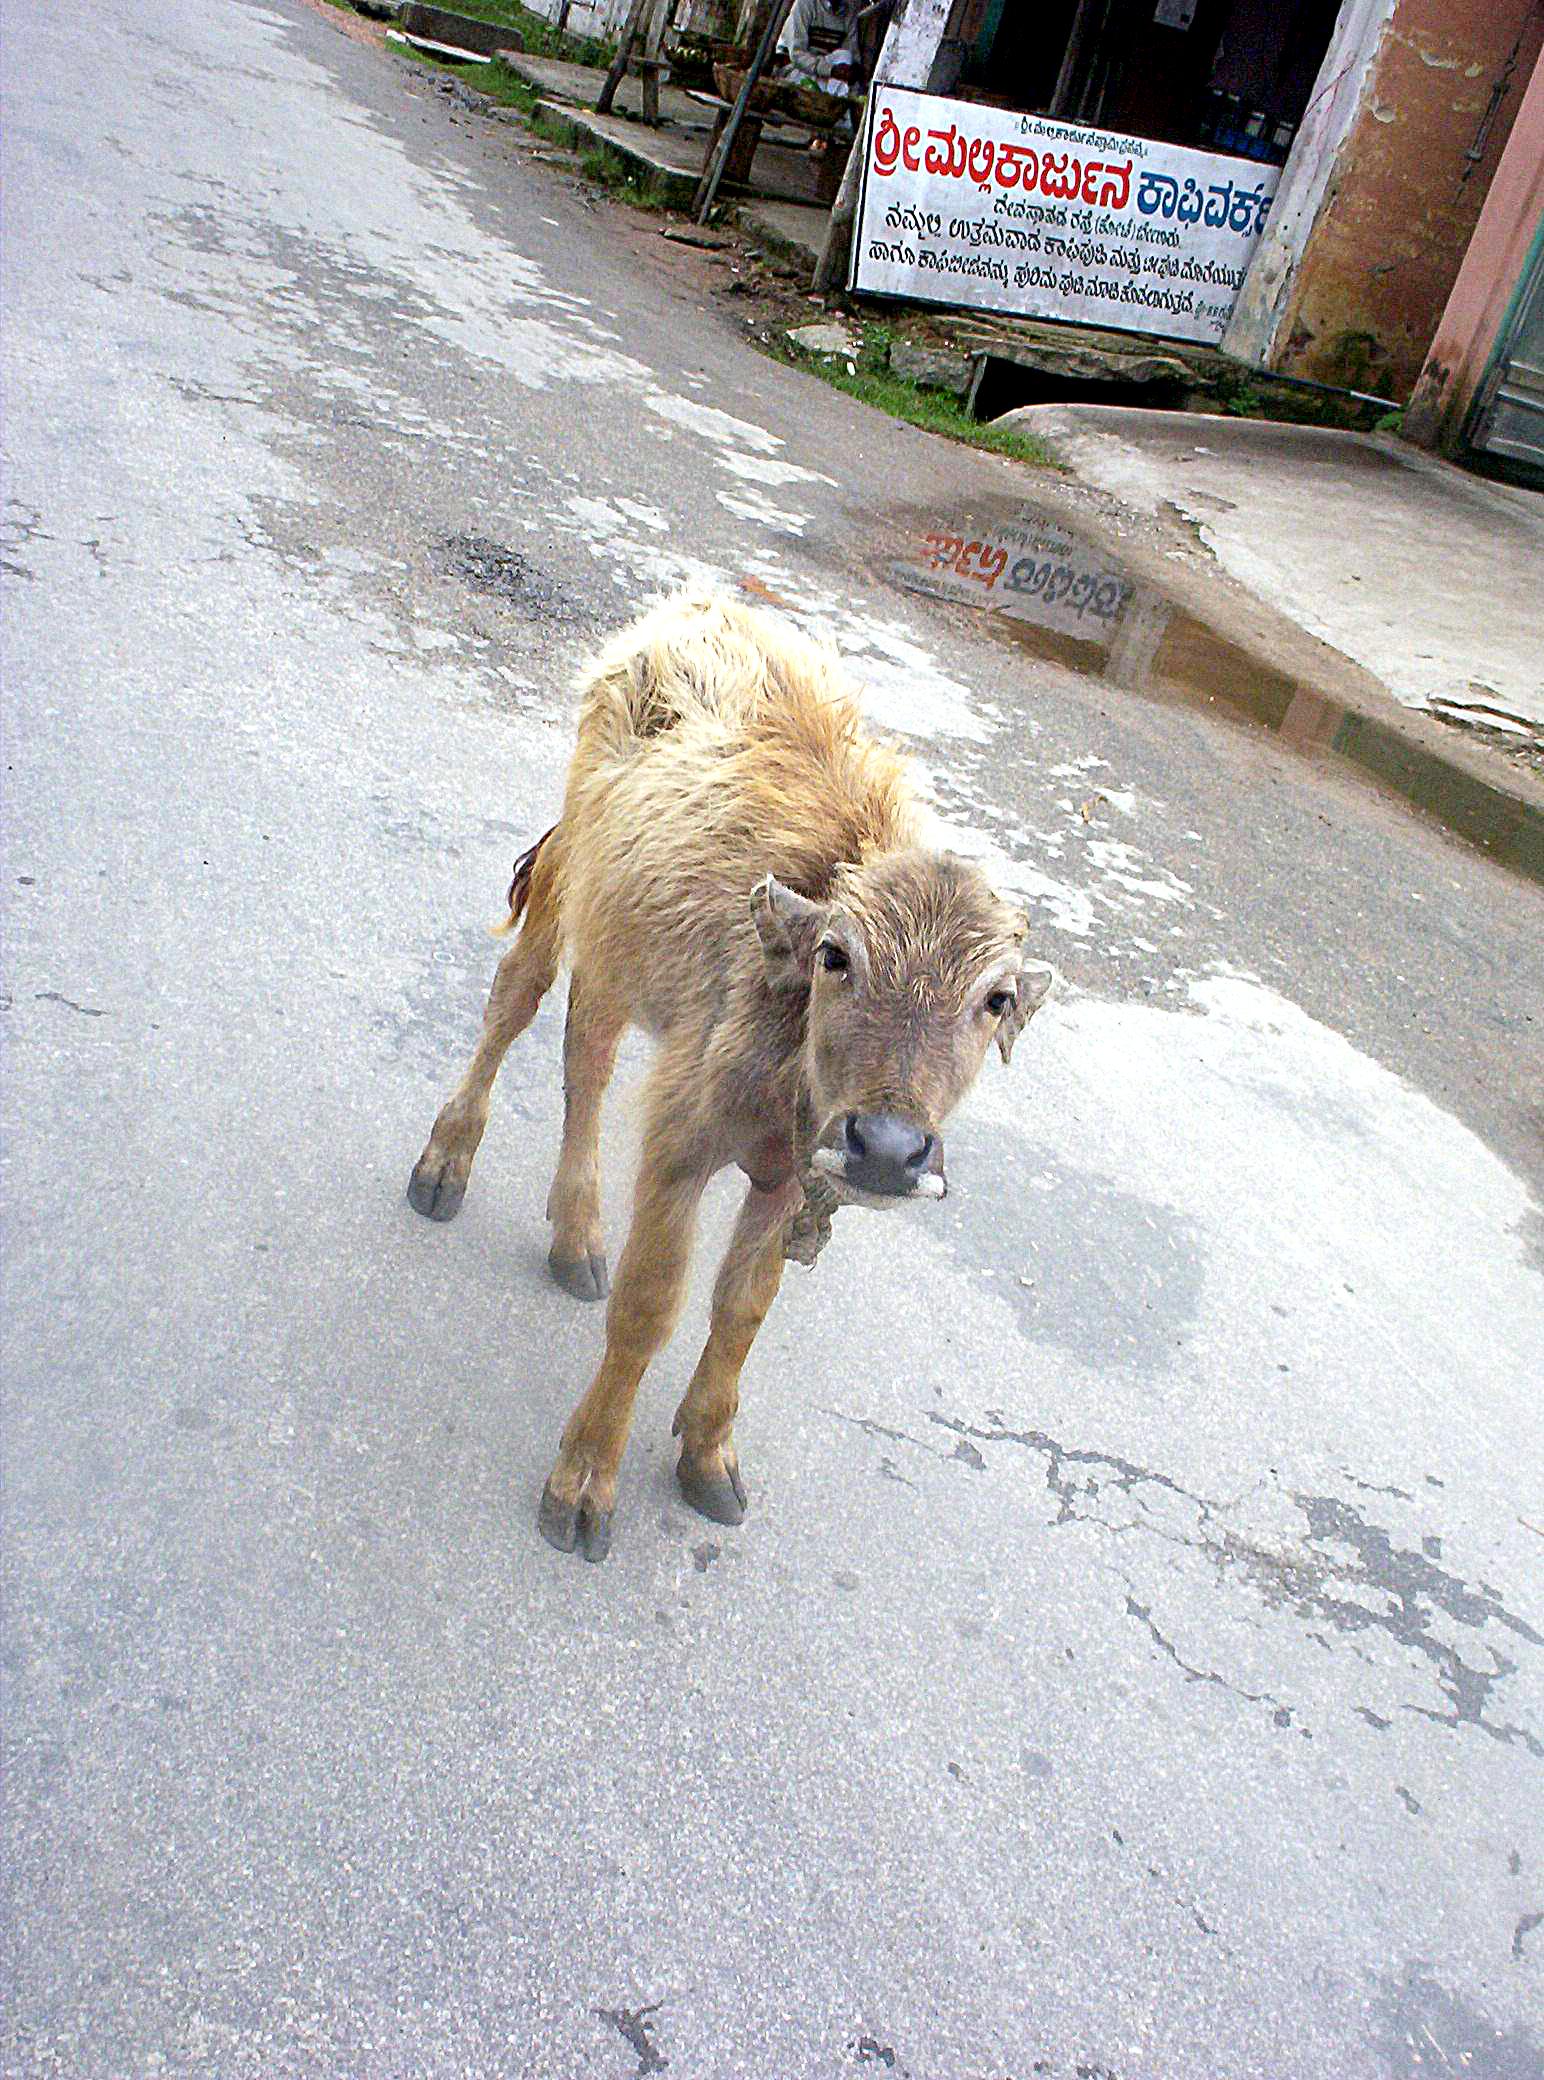 young buffello, Animal, Street, HQ Photo